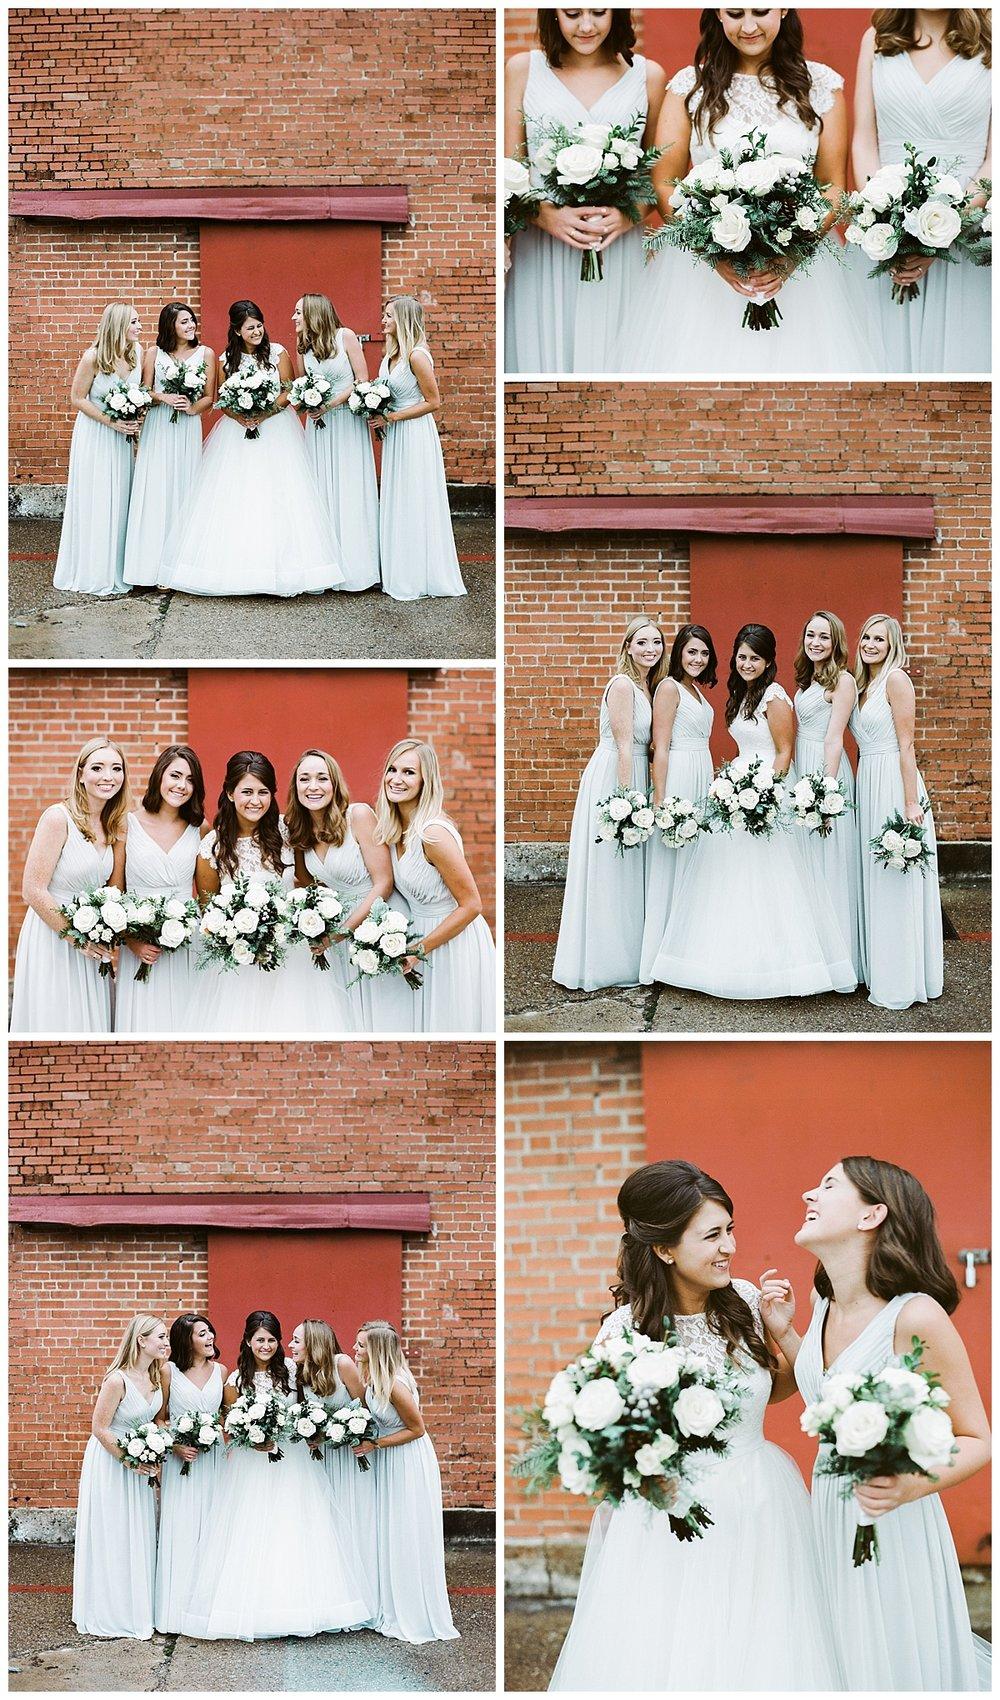 hickory-street-annex-wedding-ar-photography-5.jpg